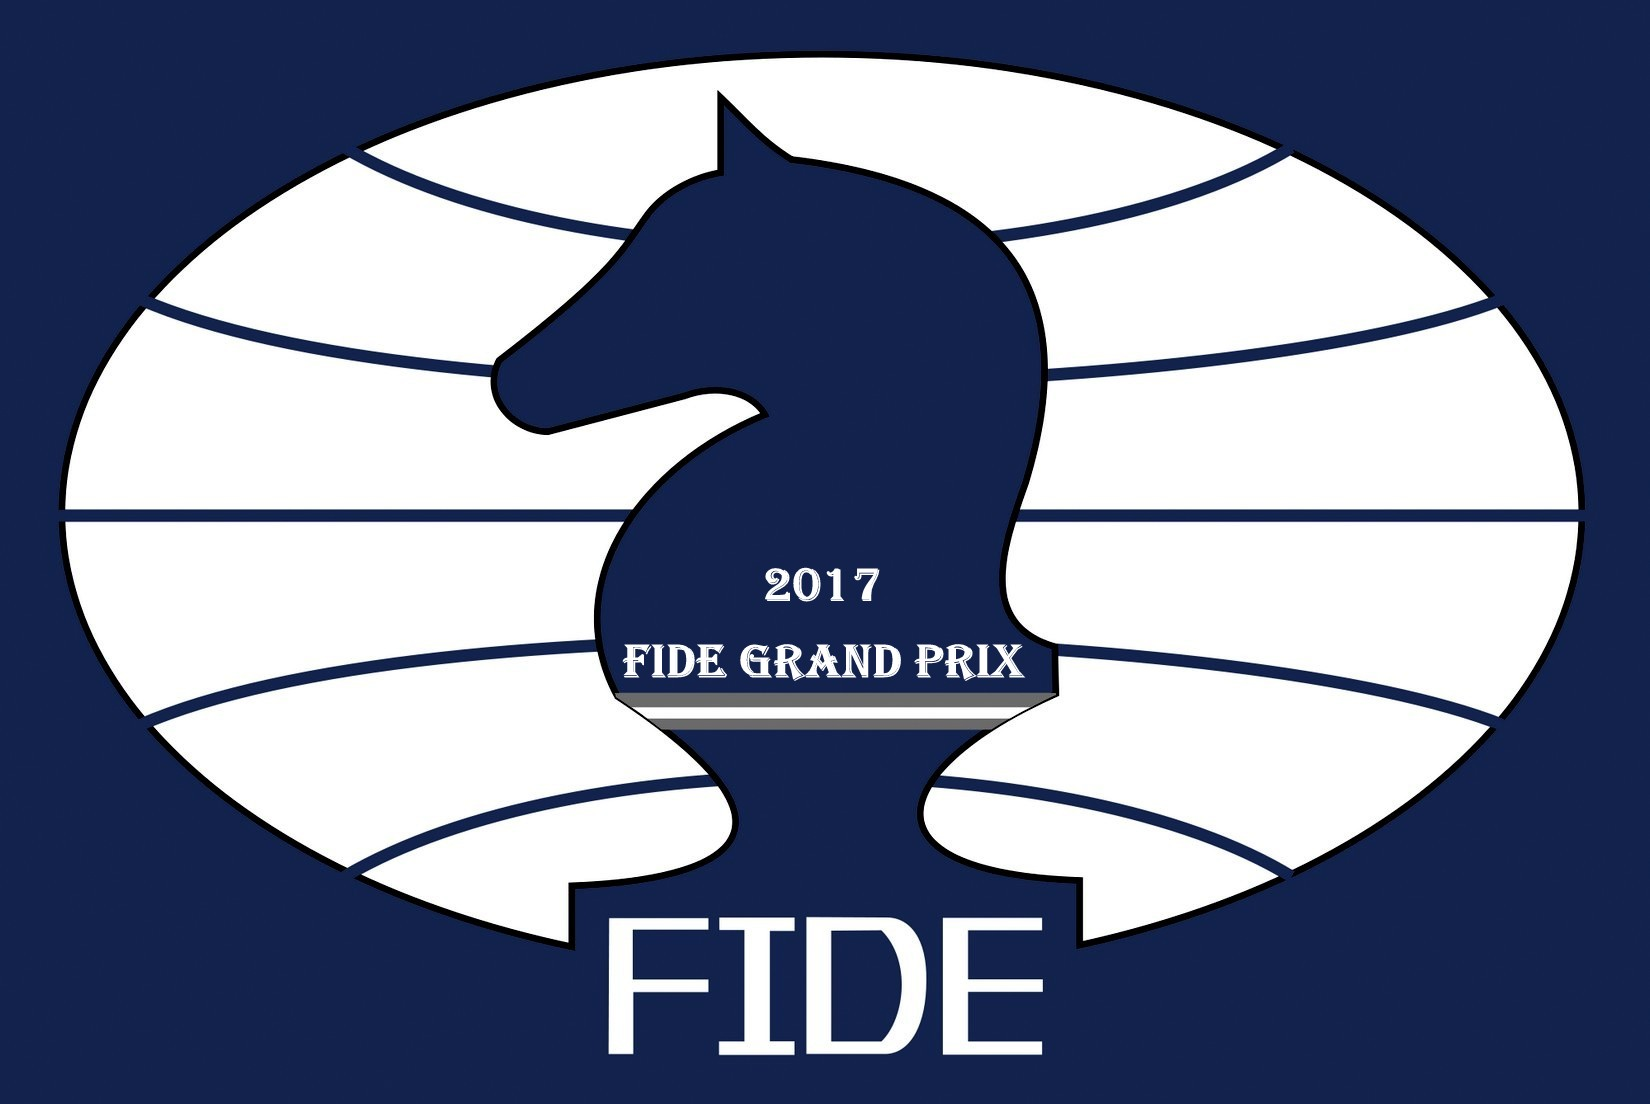 Gran Prix Fide